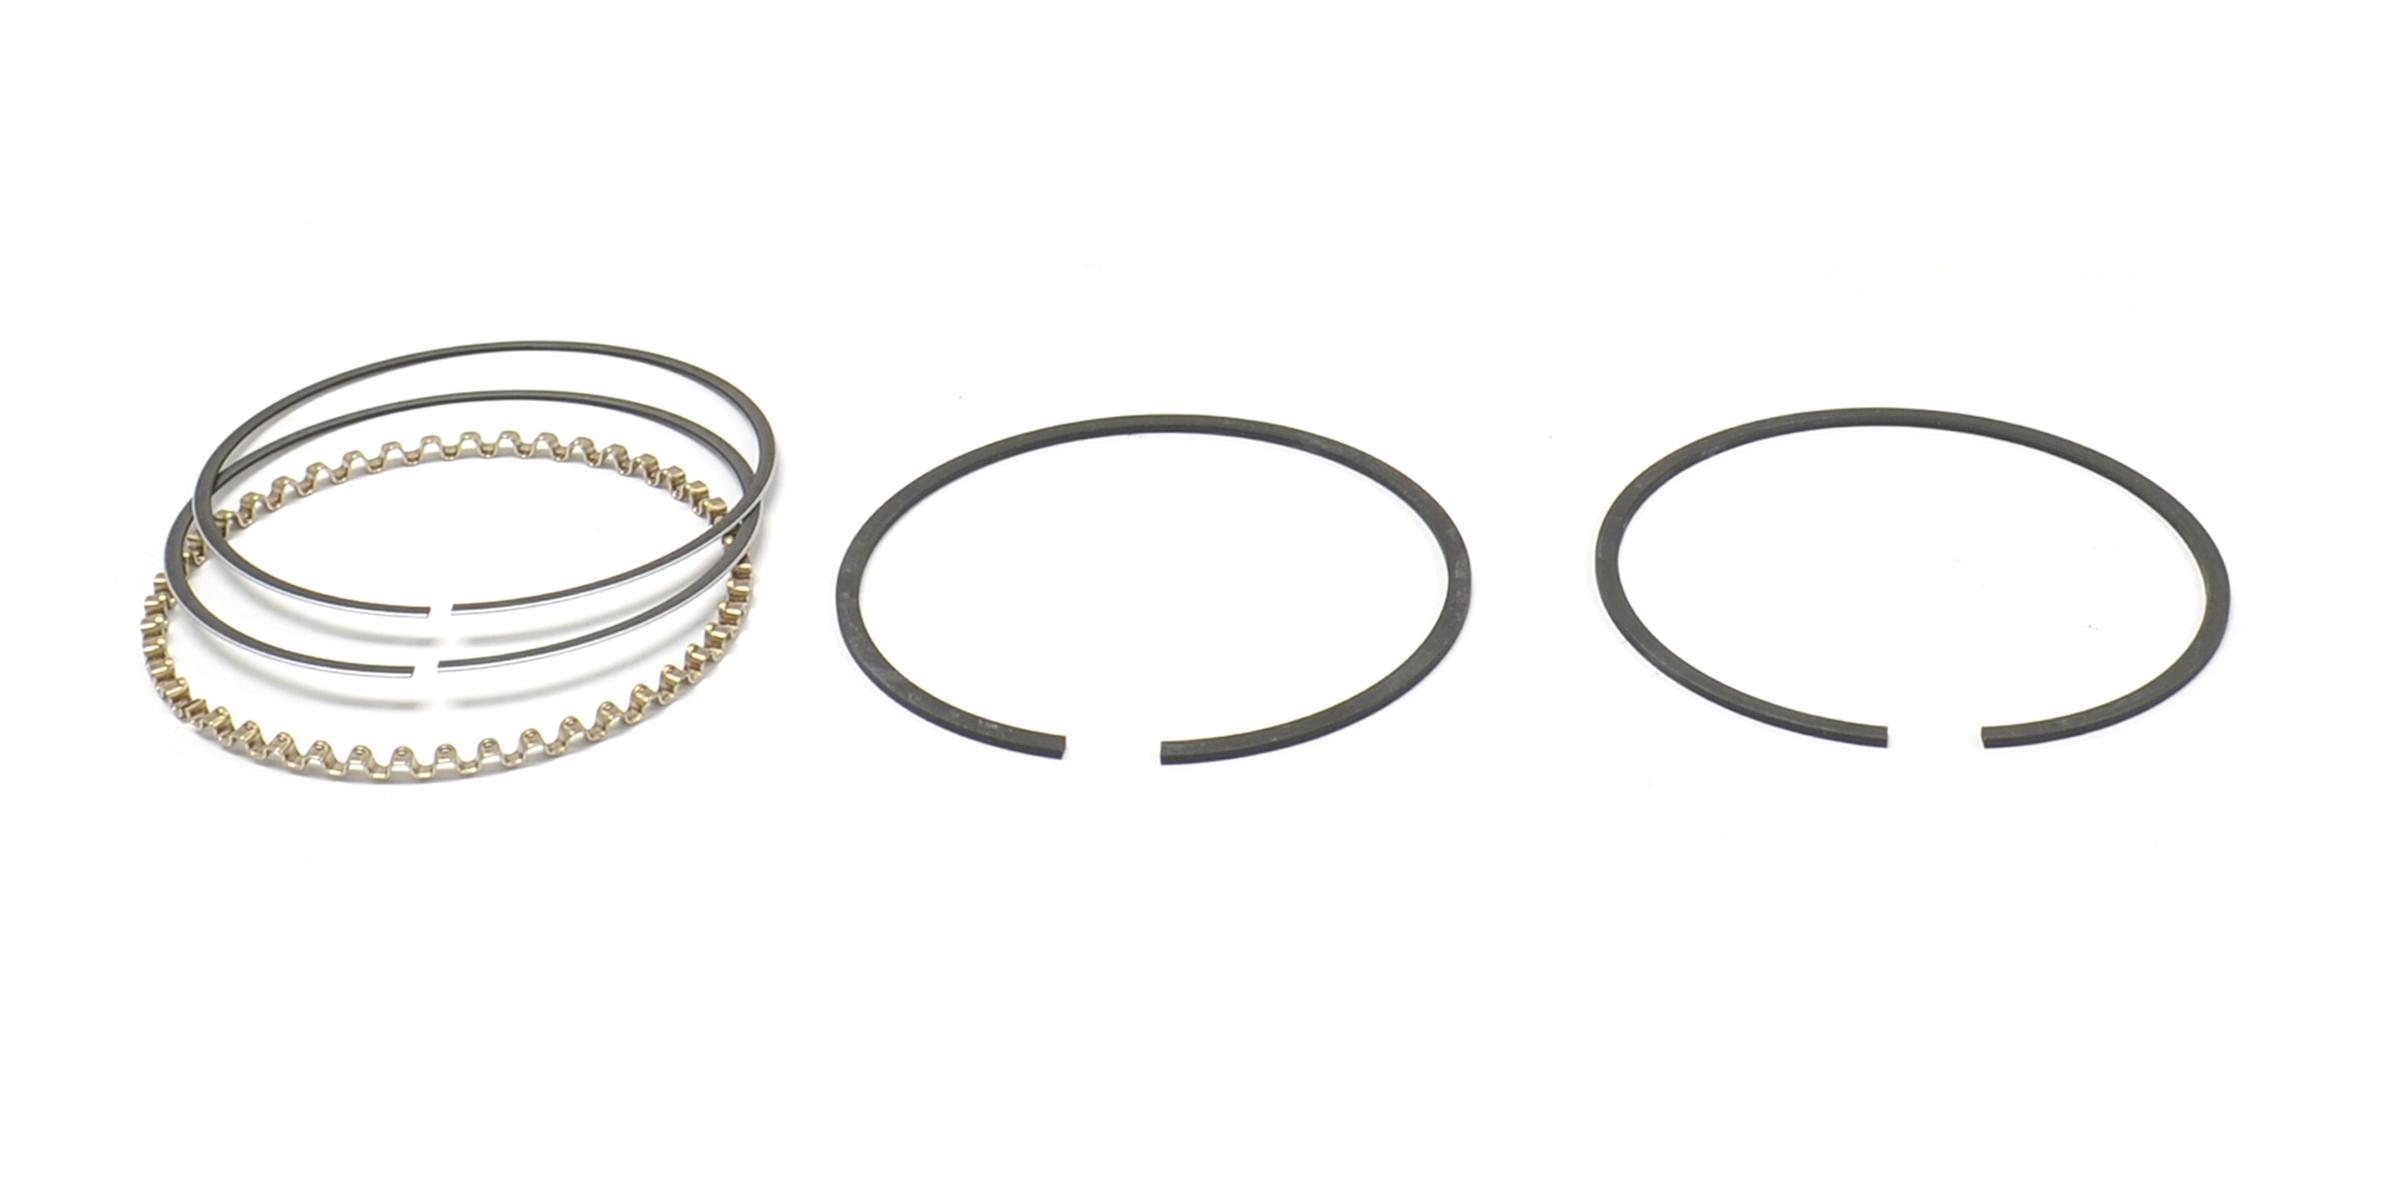 Bsa B44 441 Single Hastings Piston Ring Set R Hstd